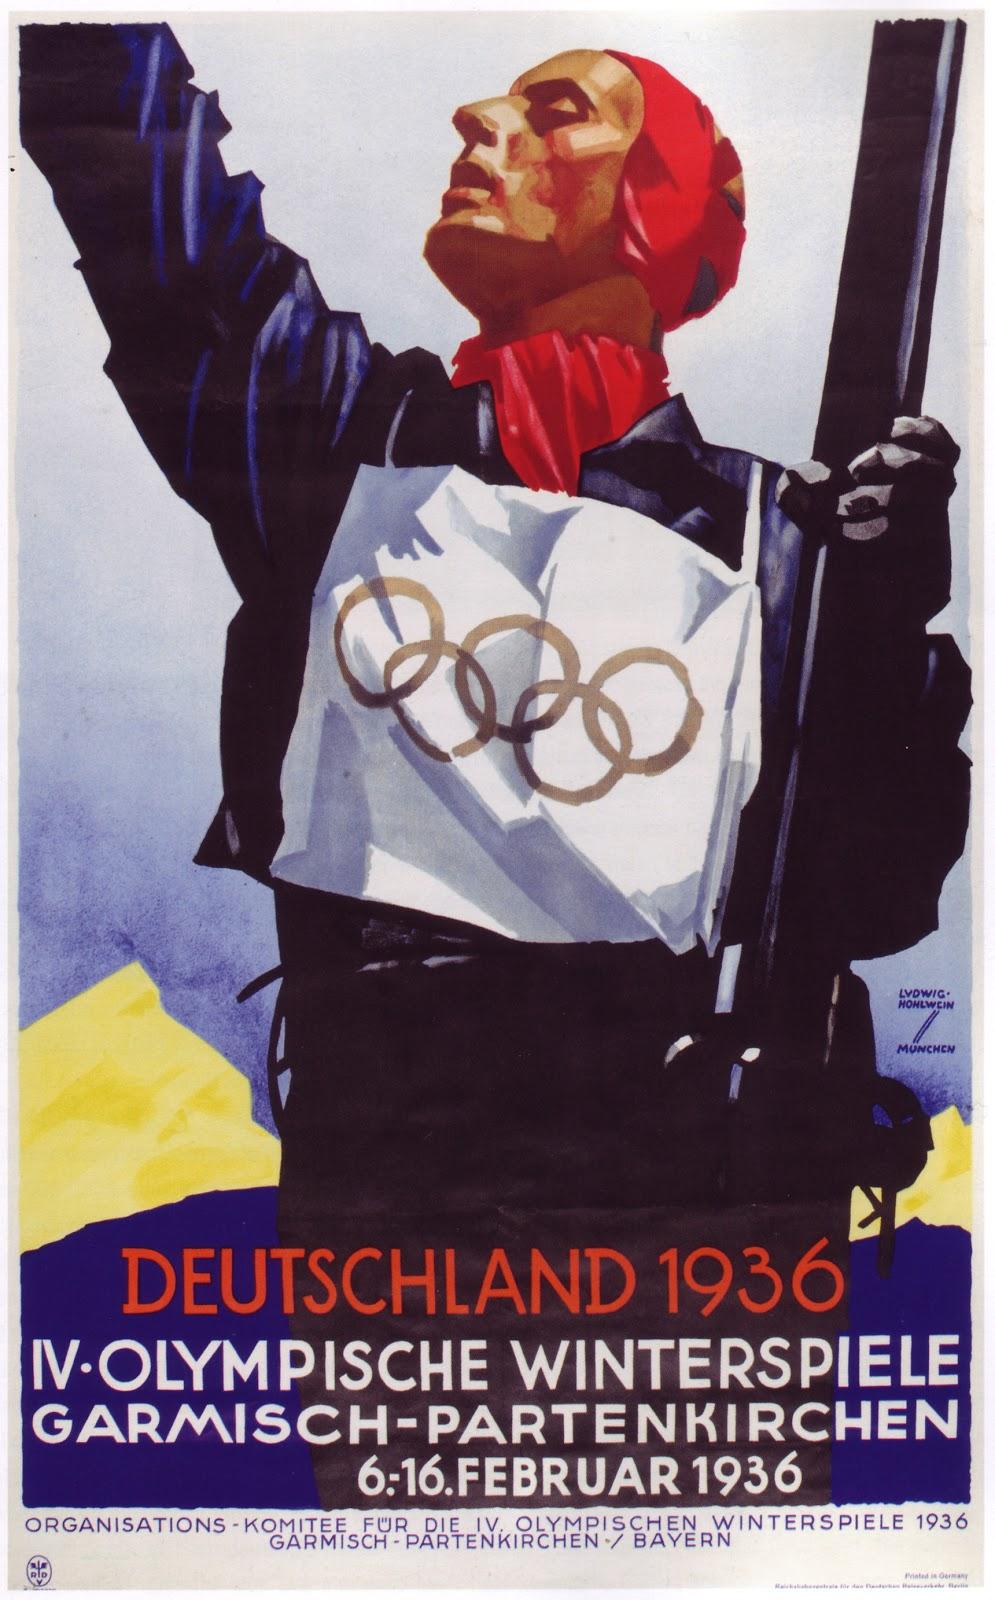 1936-Winter-Olympic-Games-Germany-Garmisch-Partenkirchen1